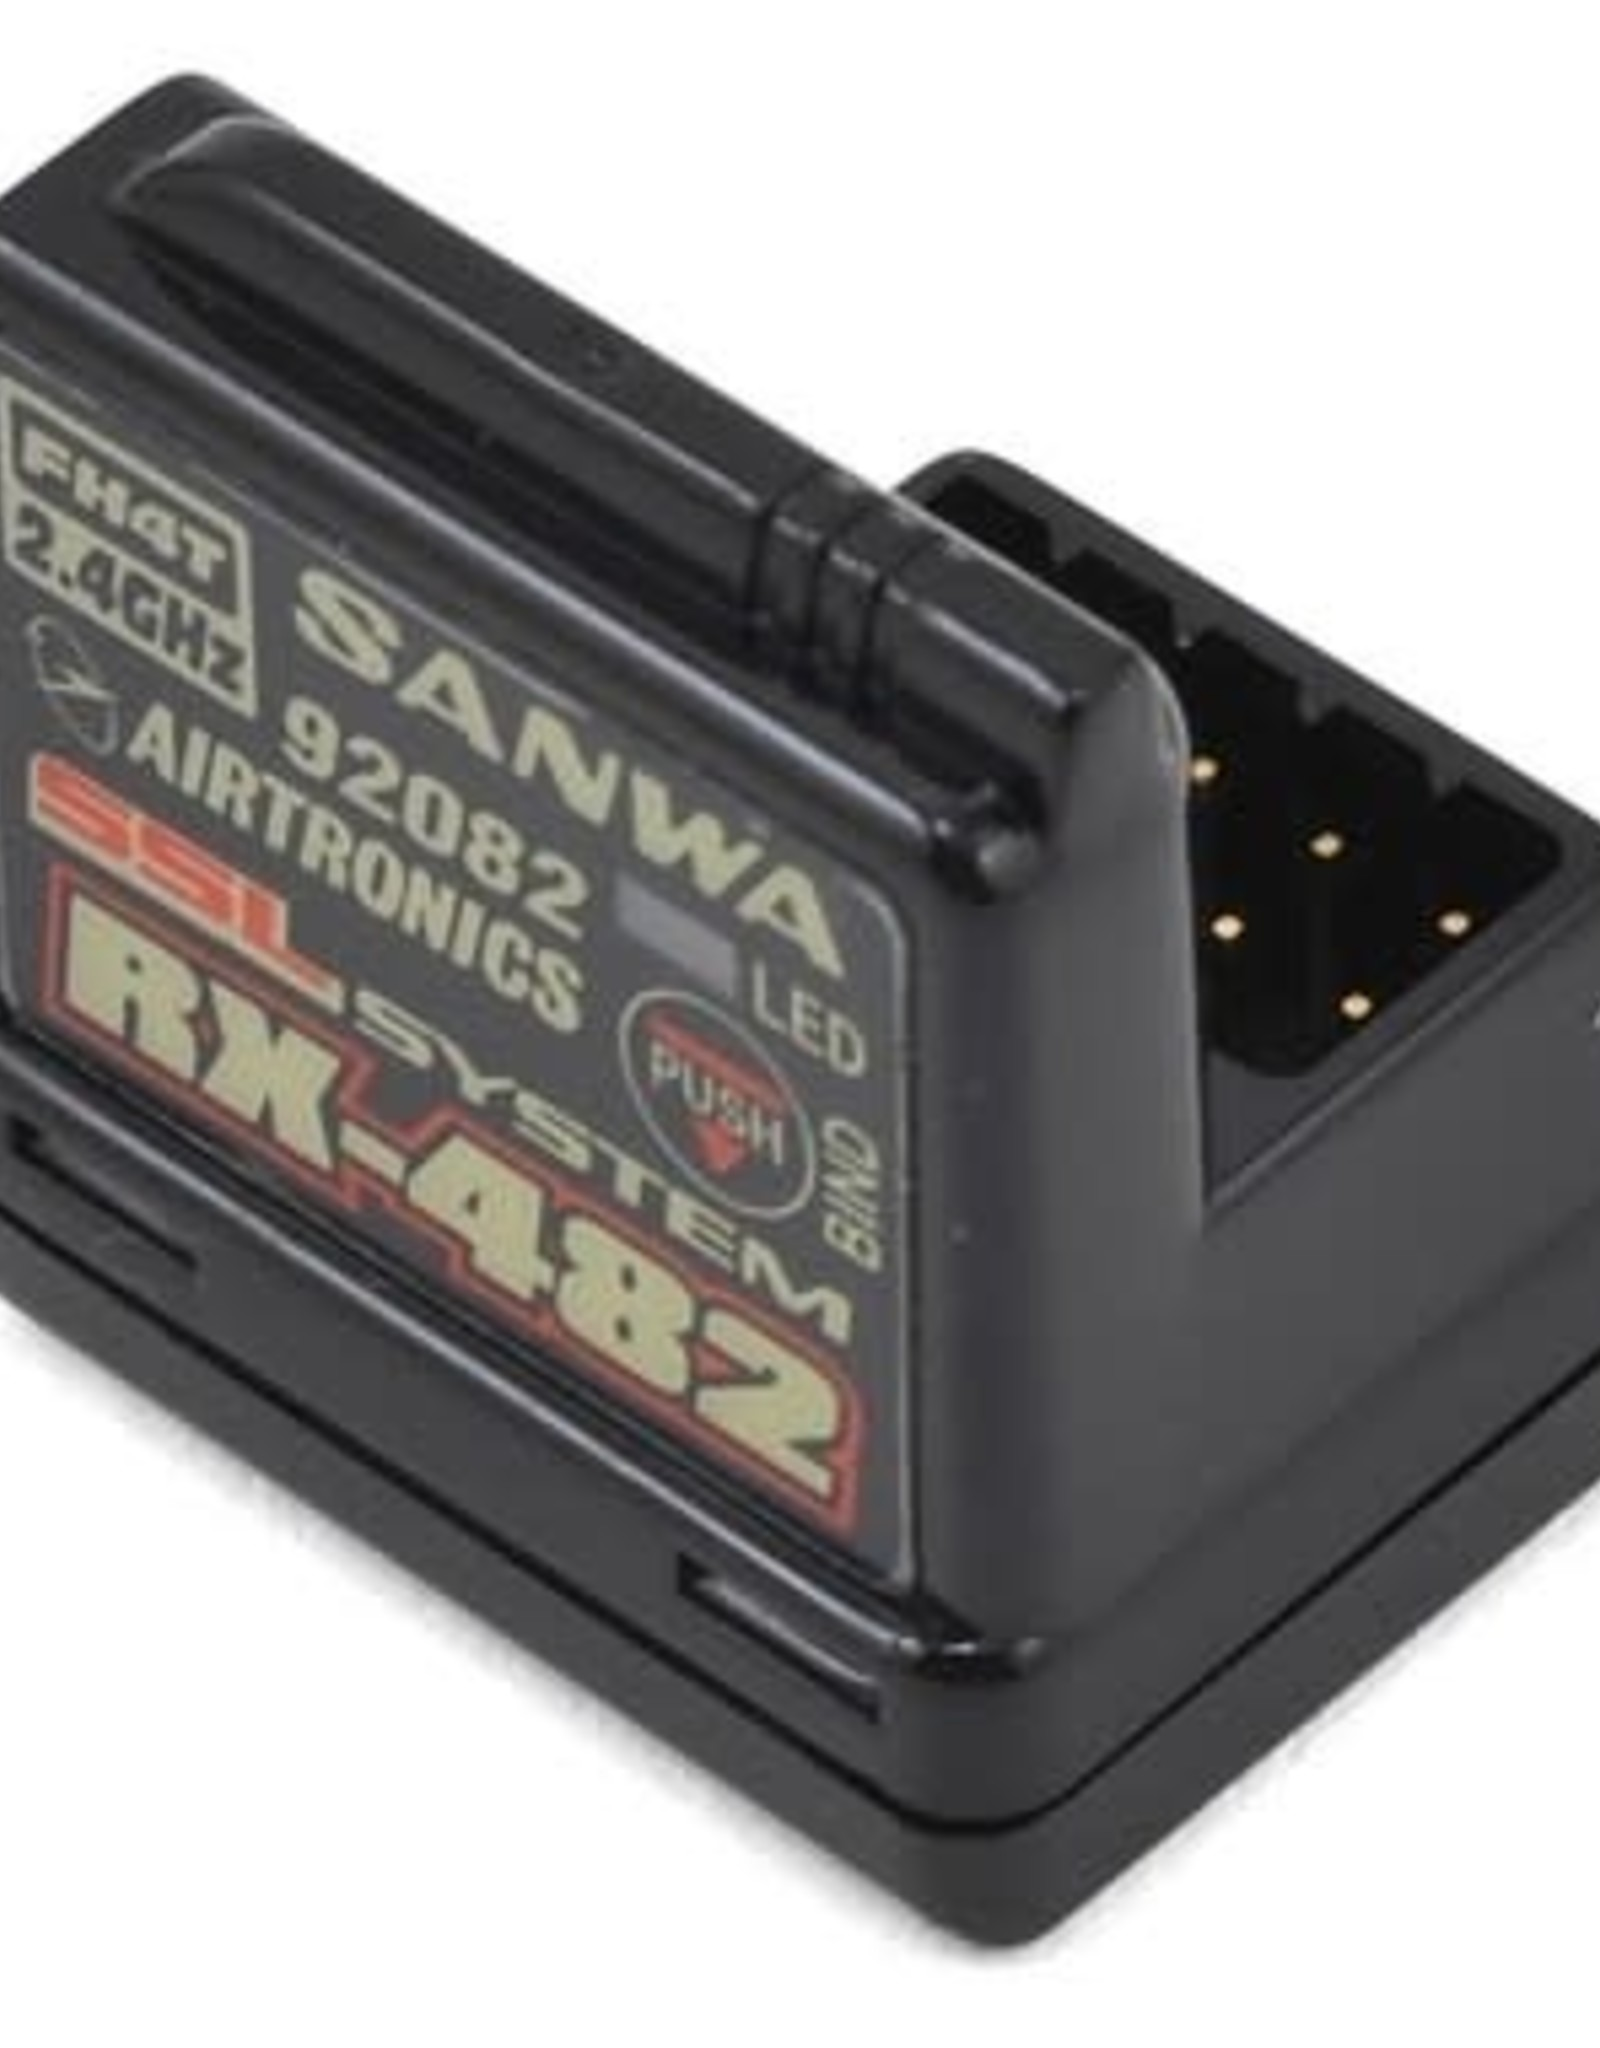 Sanwa Sanwa/Airtronics RX-482 2.4GHz 4-Channel FHSS-4 SSL Telemetry Receiver